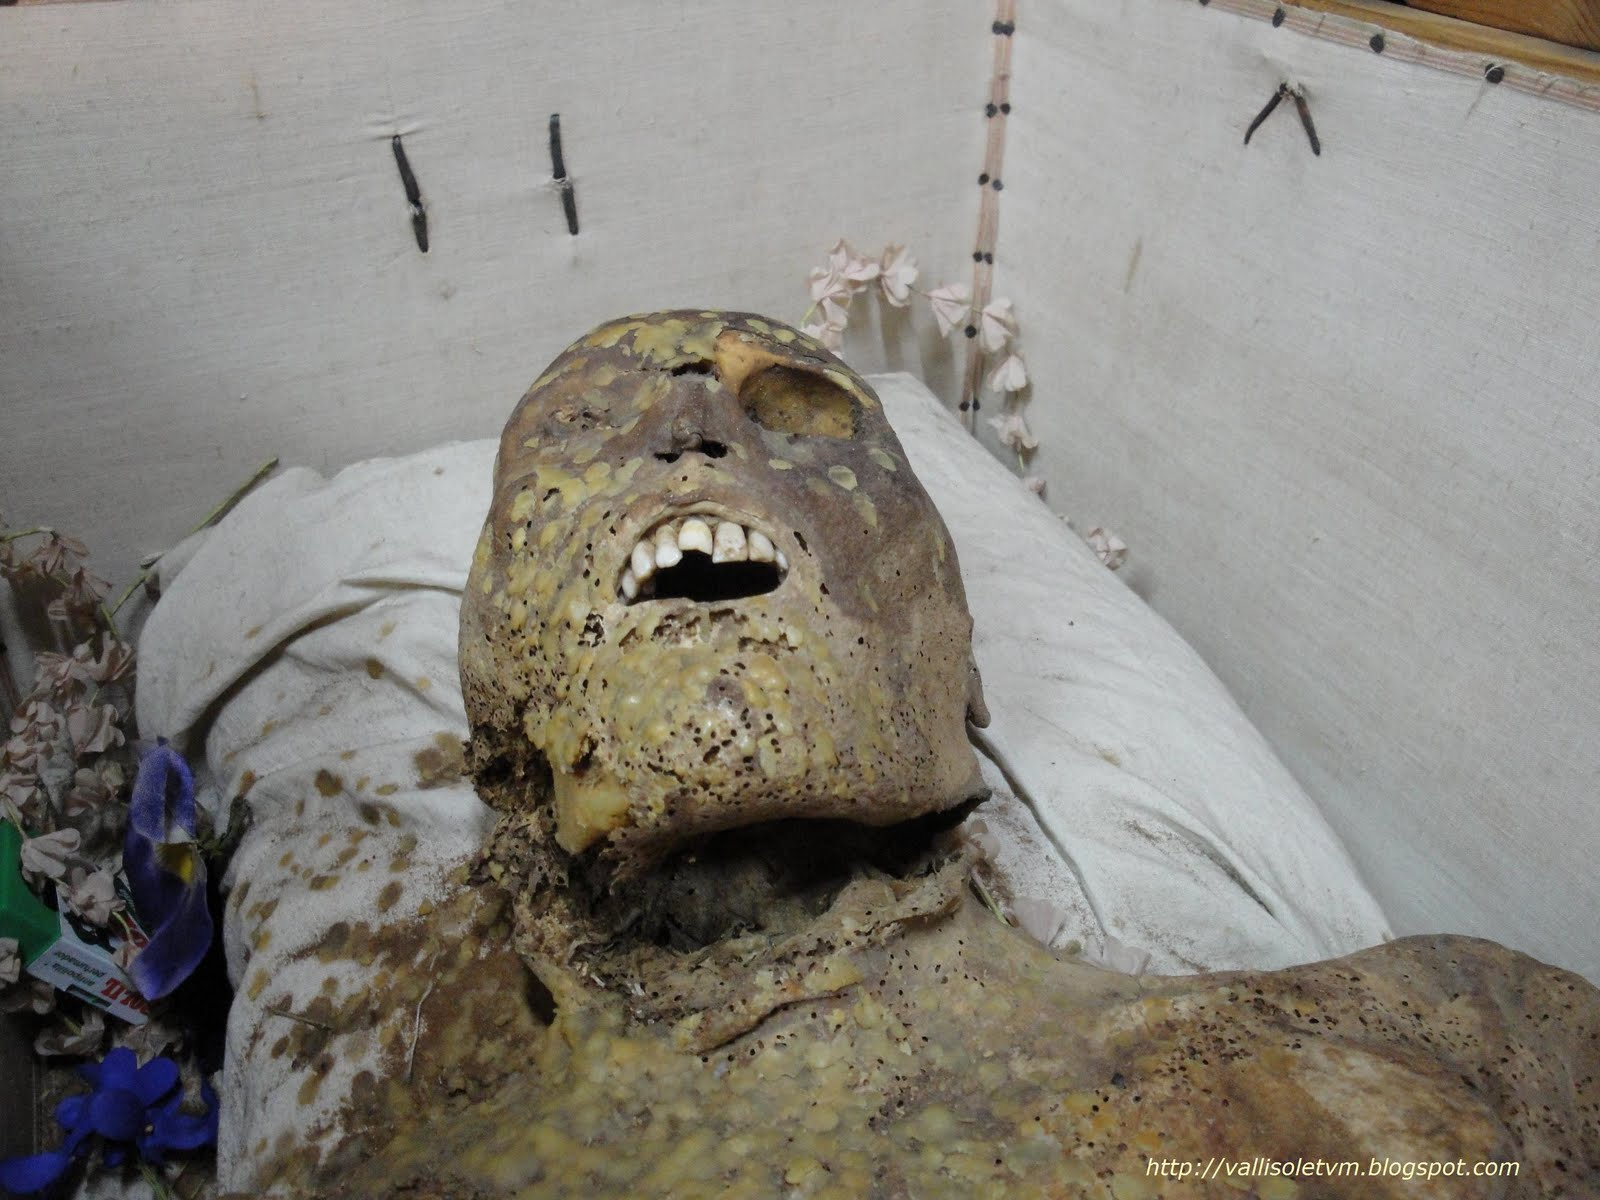 quien era san juan tumba tumba: